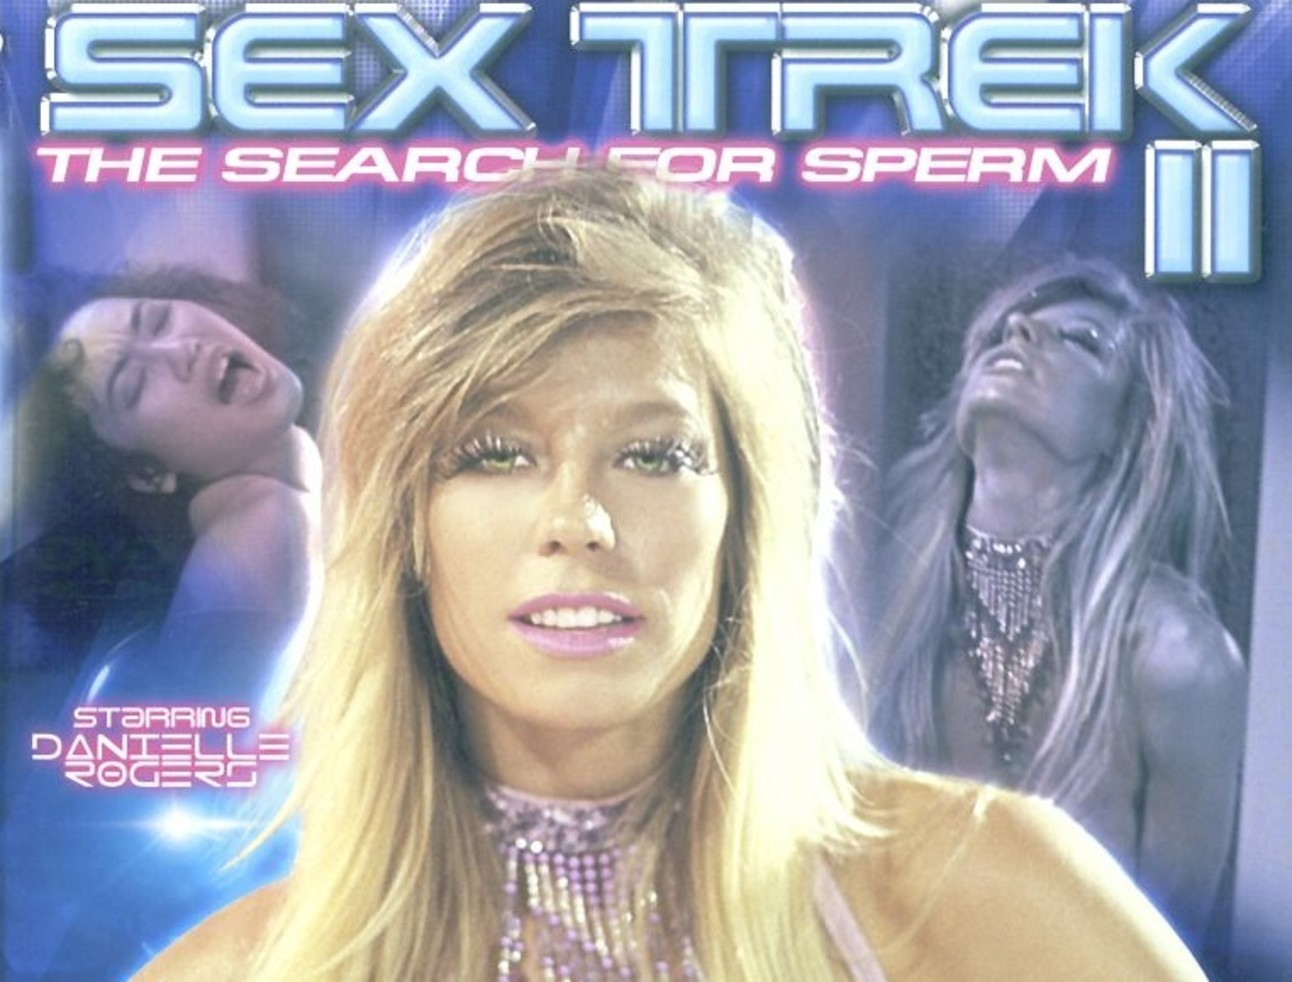 Sex_trek_II.jpg